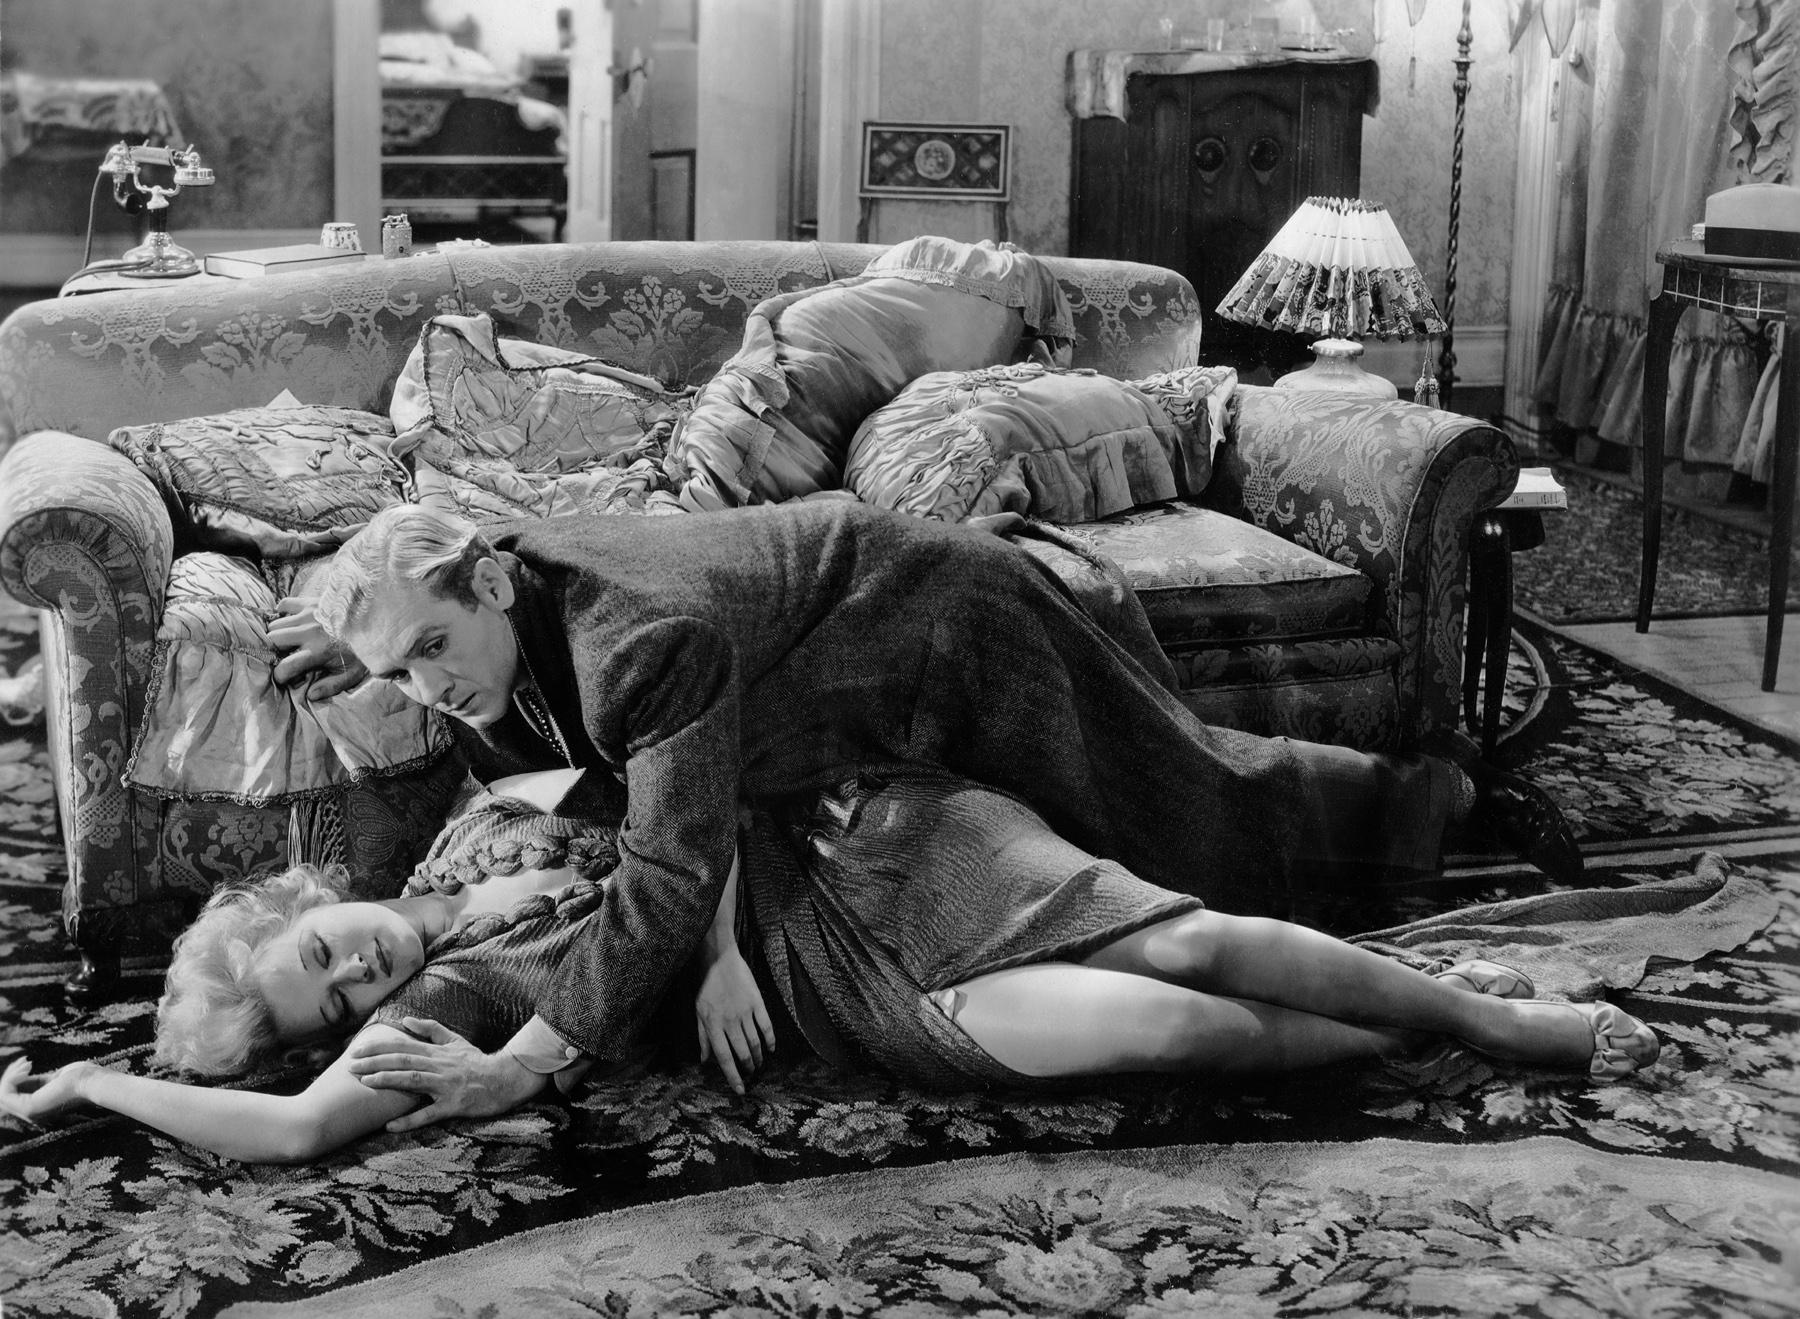 Connie Ray,Samantha Janus (born 1972) Erotic pics & movies Emmy Perry,Pamela Anderson